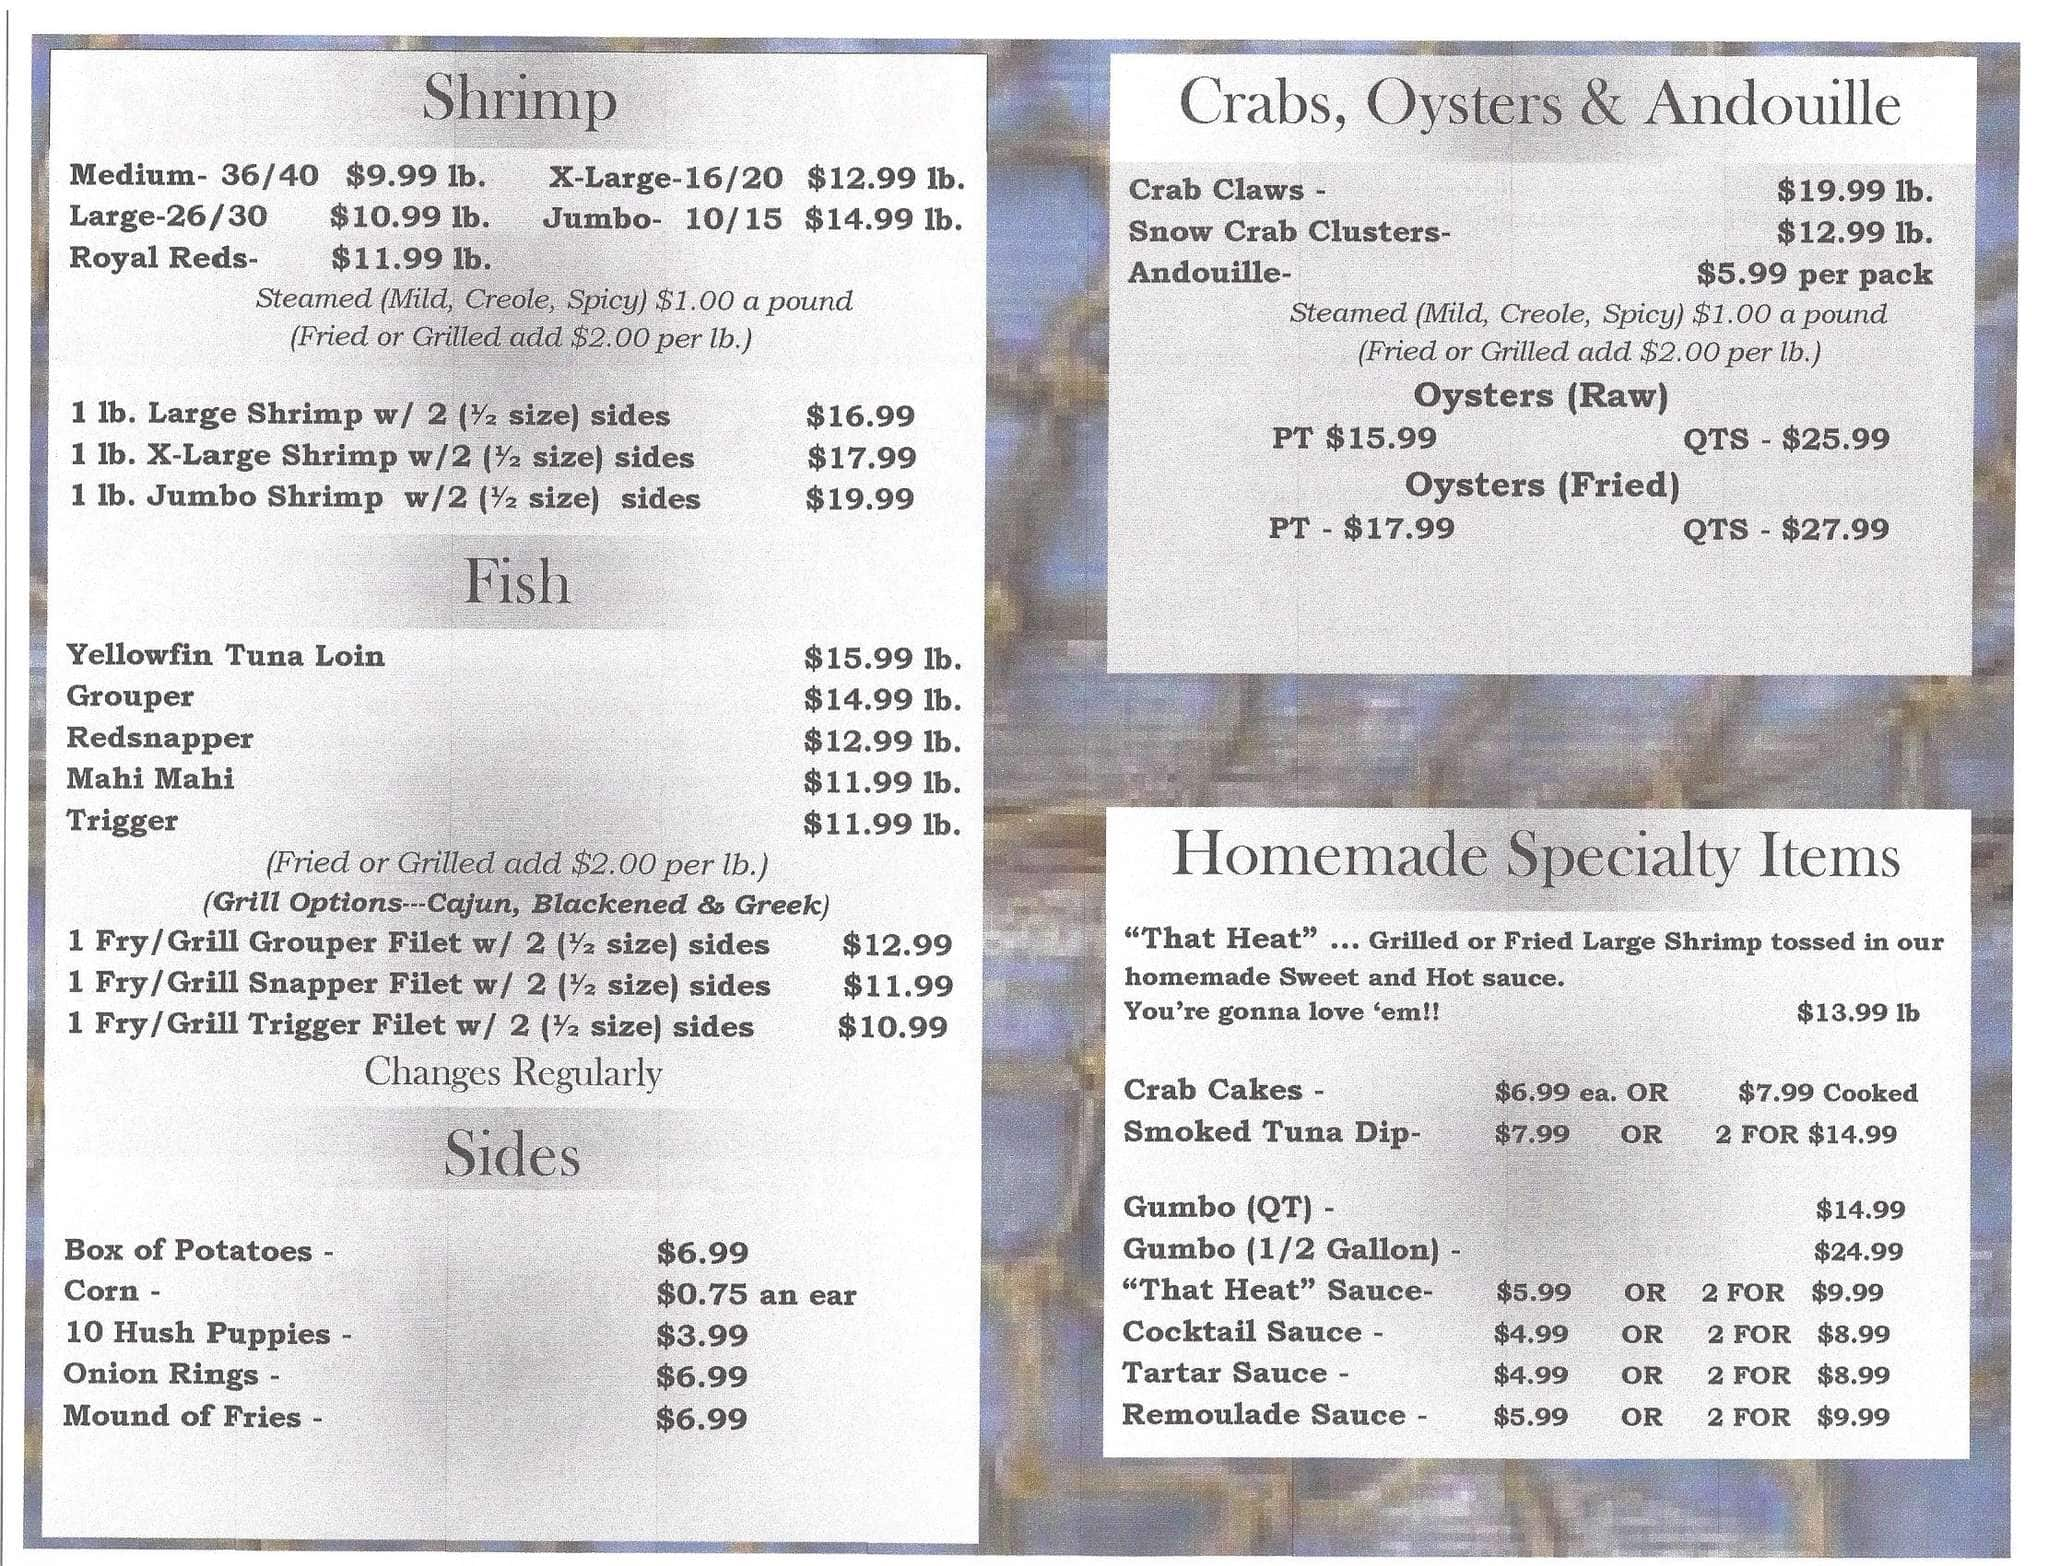 S Seafood Market Menu